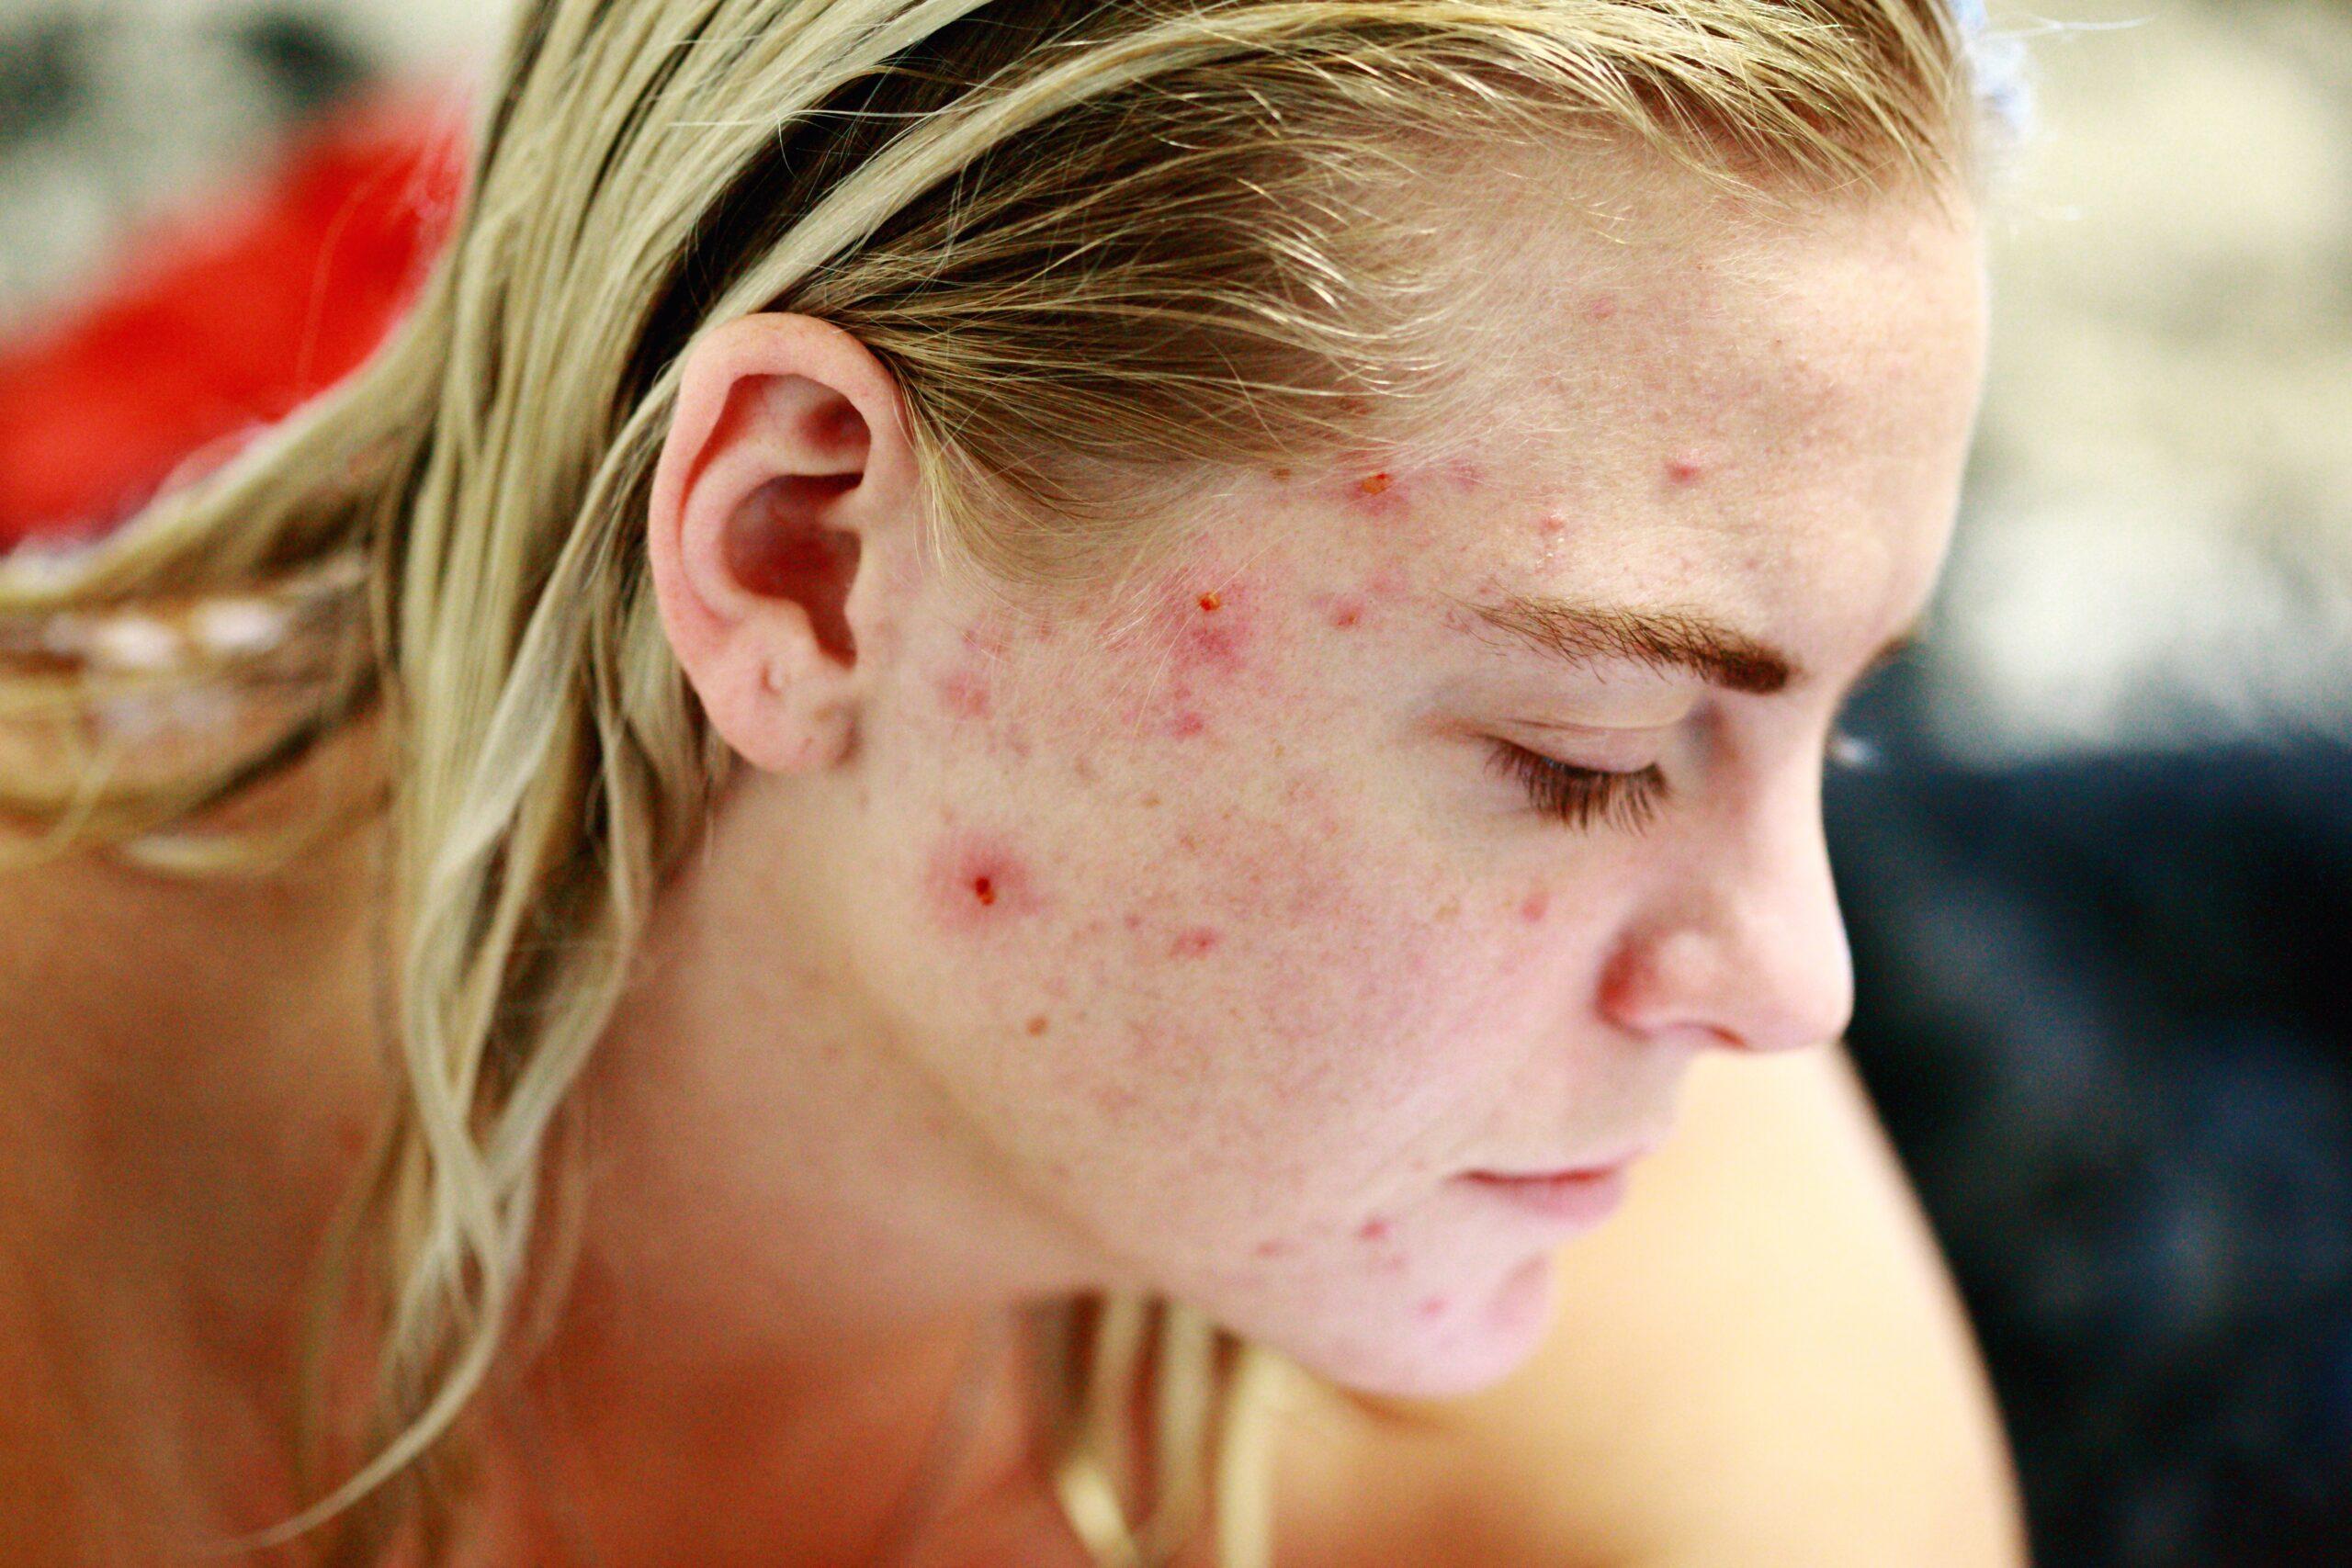 acne pimple zit human skin